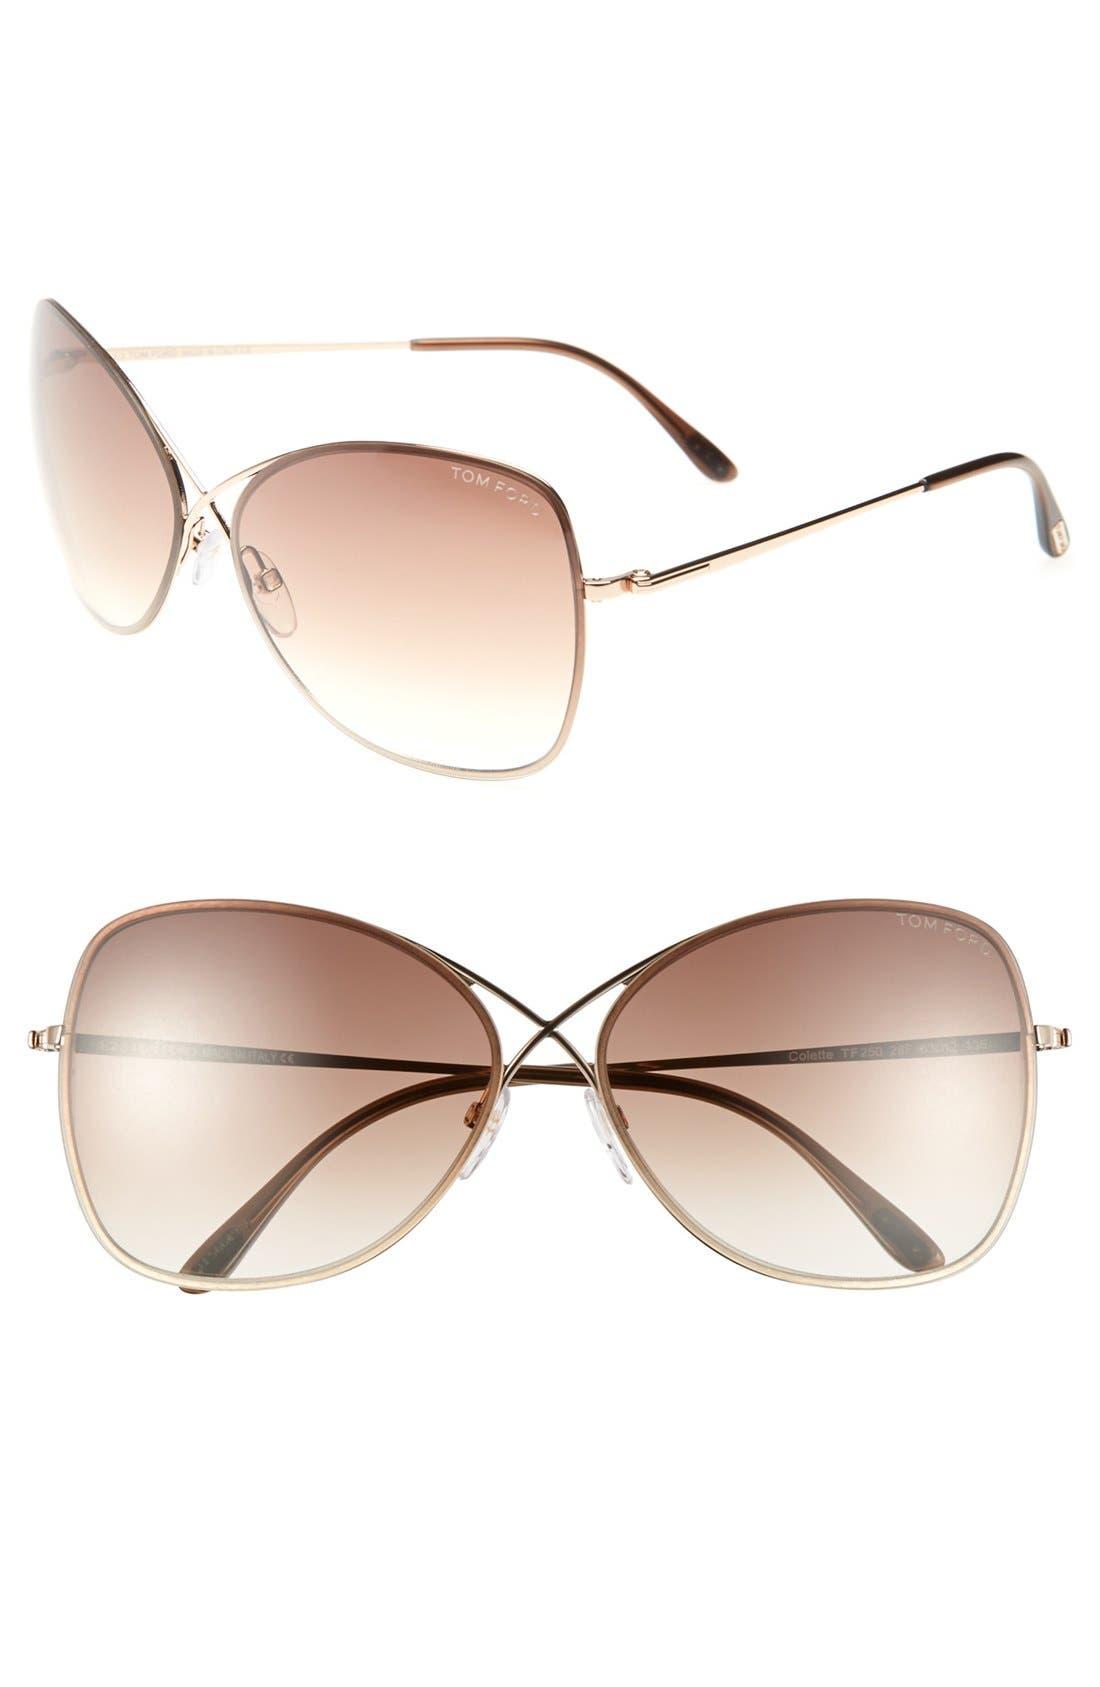 Main Image - Tom Ford 'Colette' 63mm Oversize Sunglasses